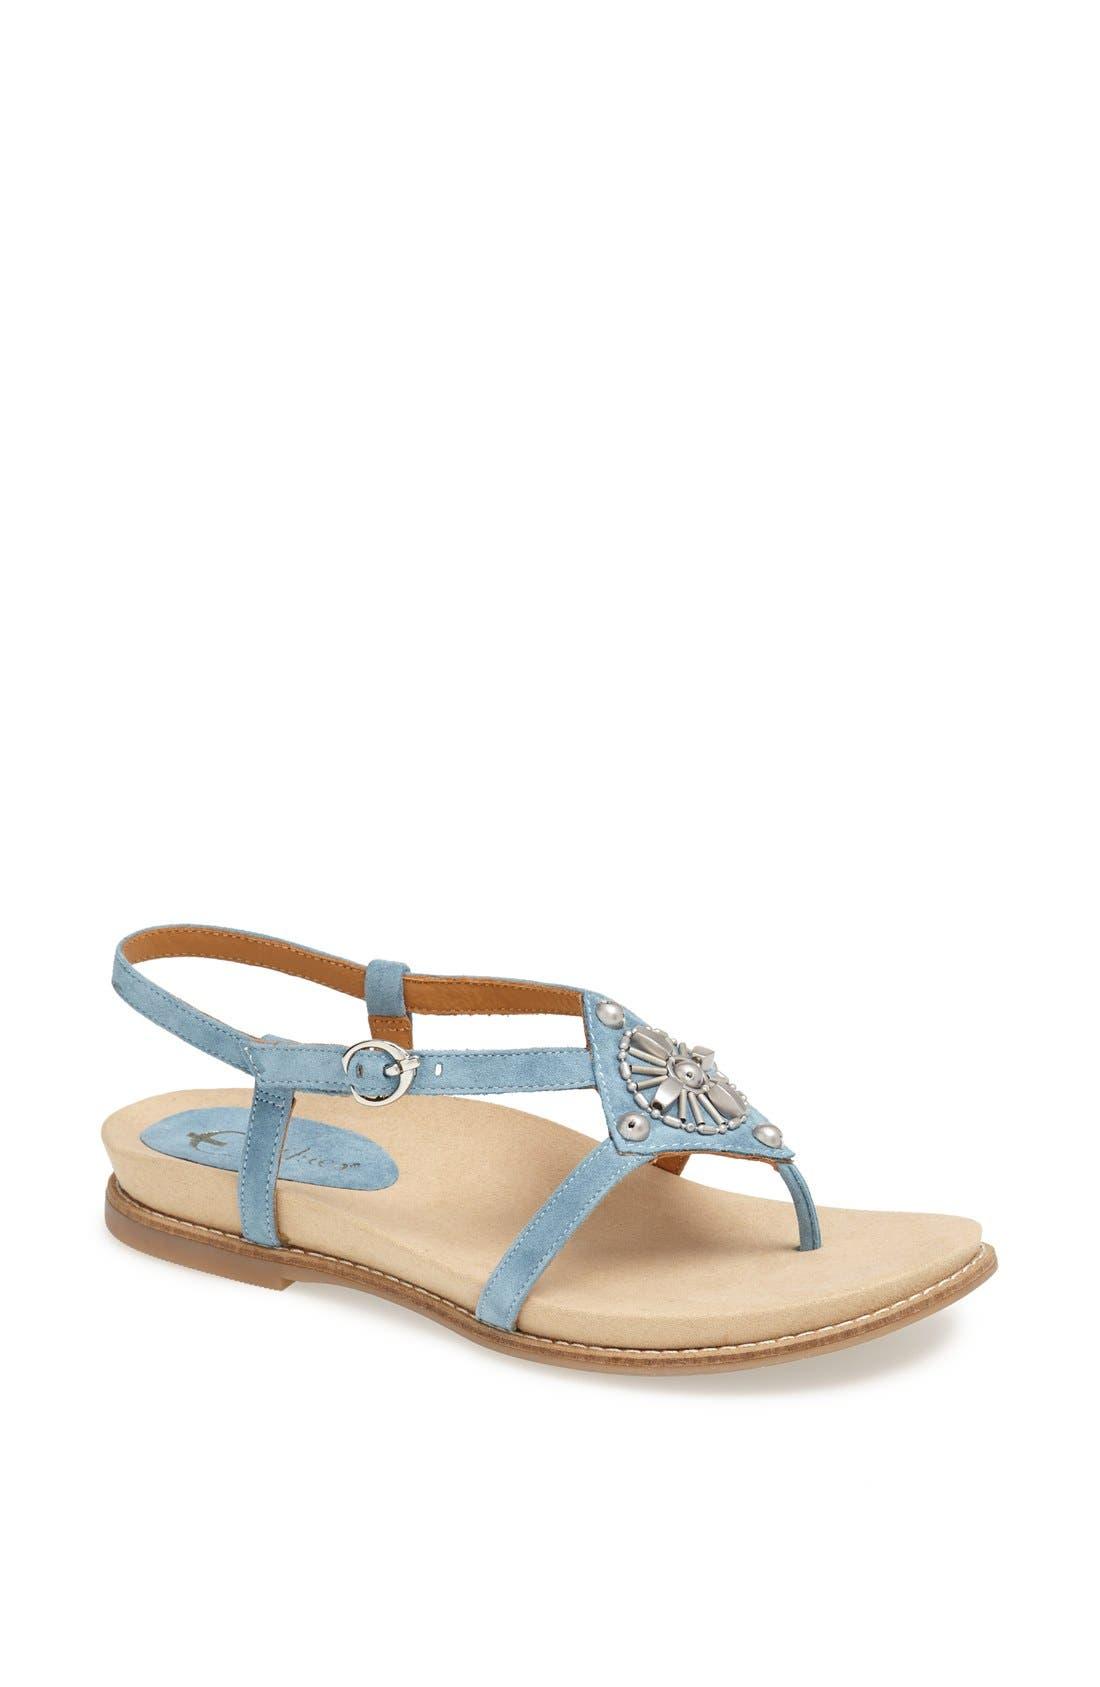 Main Image - Earthies® 'Tello' Sandal